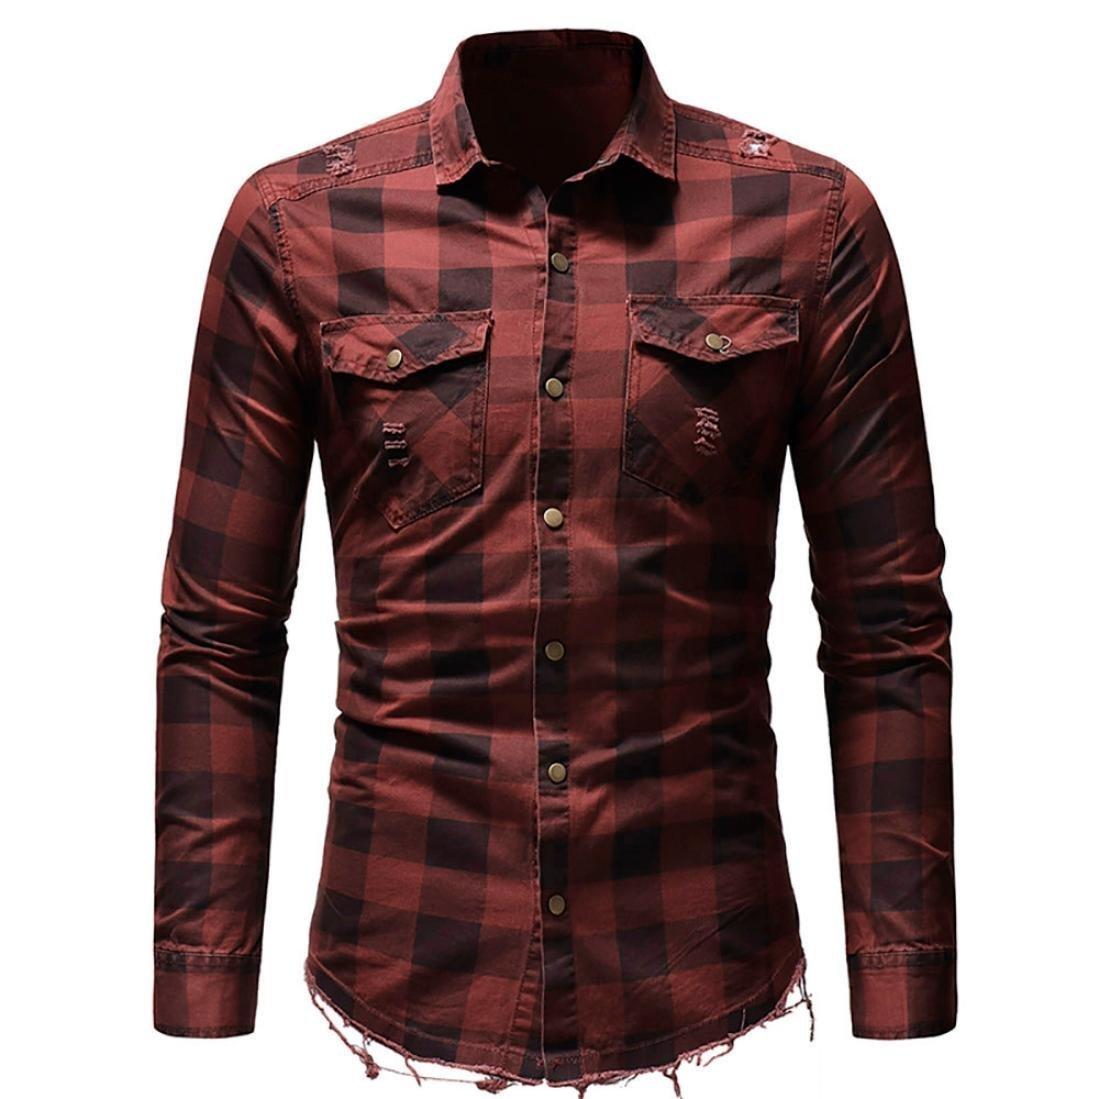 OWMEOT Men's Slim Fit Long Sleeves Casual Fashion Shirts (Red, 2XL)